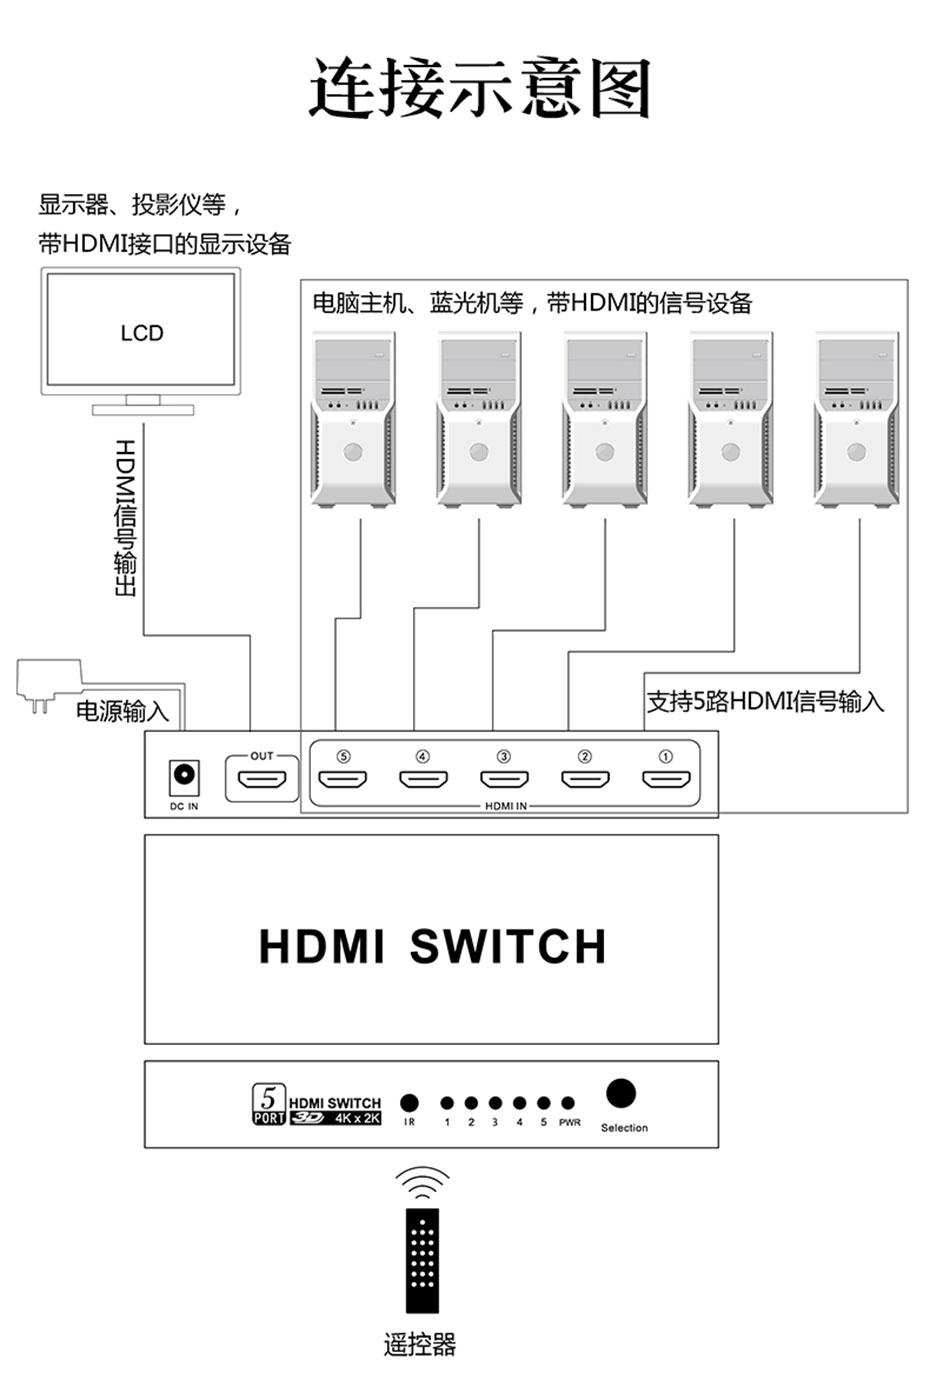 HDMI切换器5进1出/5切1/五进一出51HN使用全金属外壳